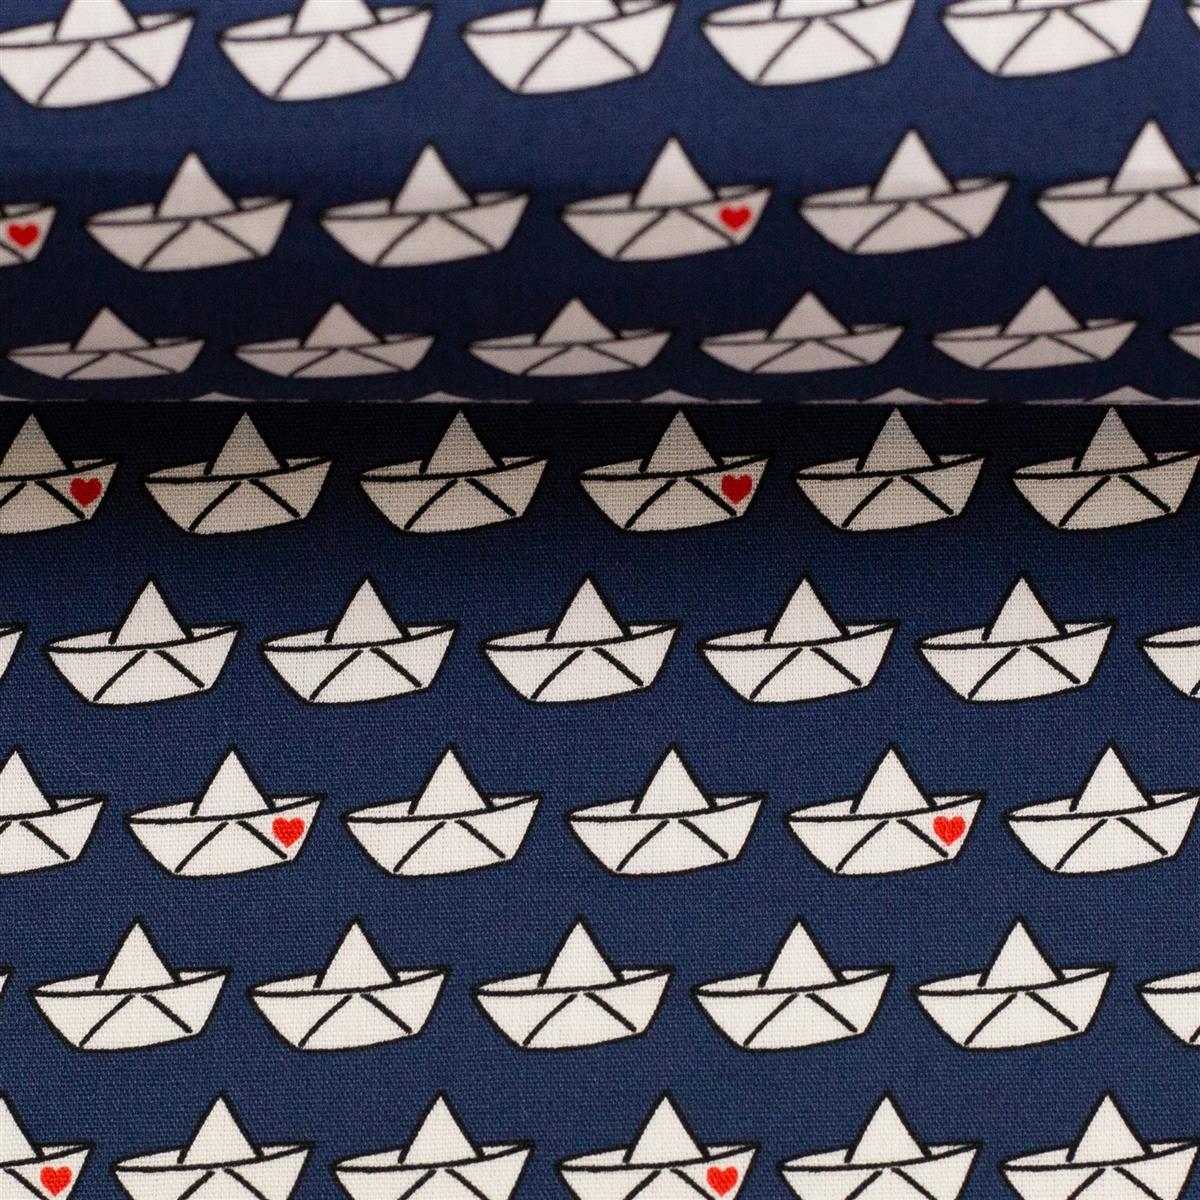 LOVEBOAT by Cherry Picking Popeline Papierboote dunkelblau